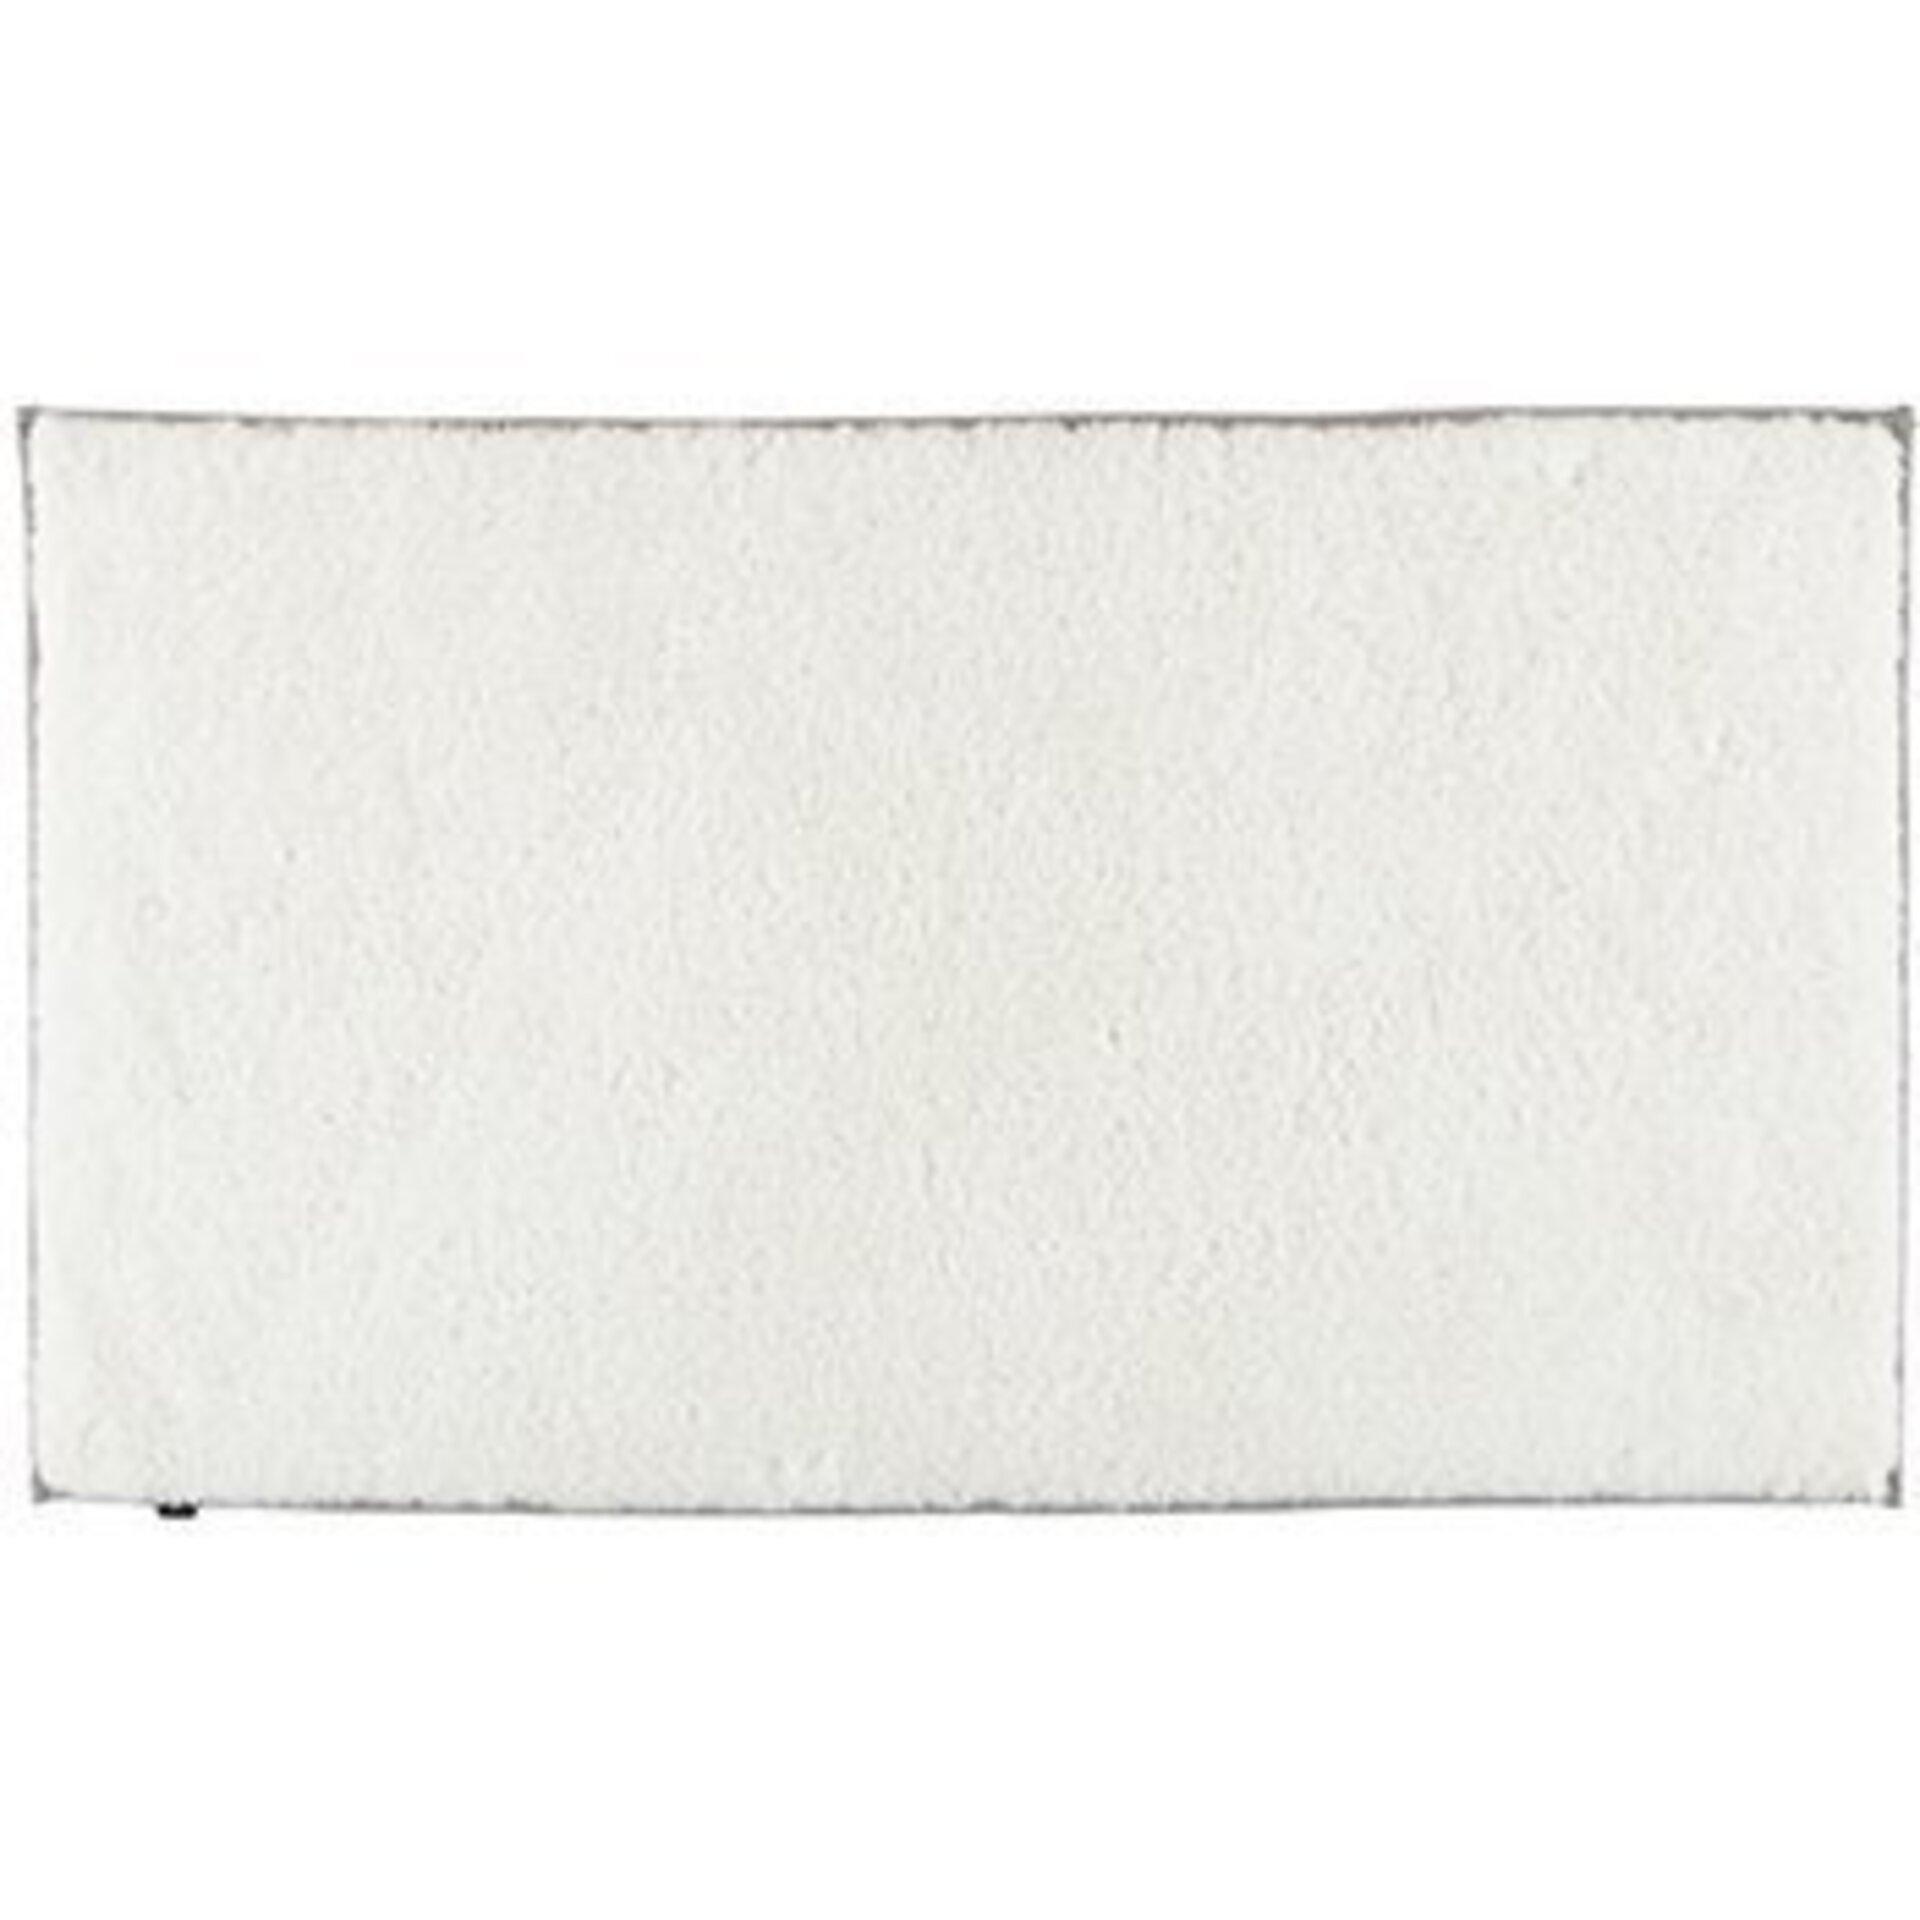 Badteppich Frame Cawö Textil 60 x 100 cm